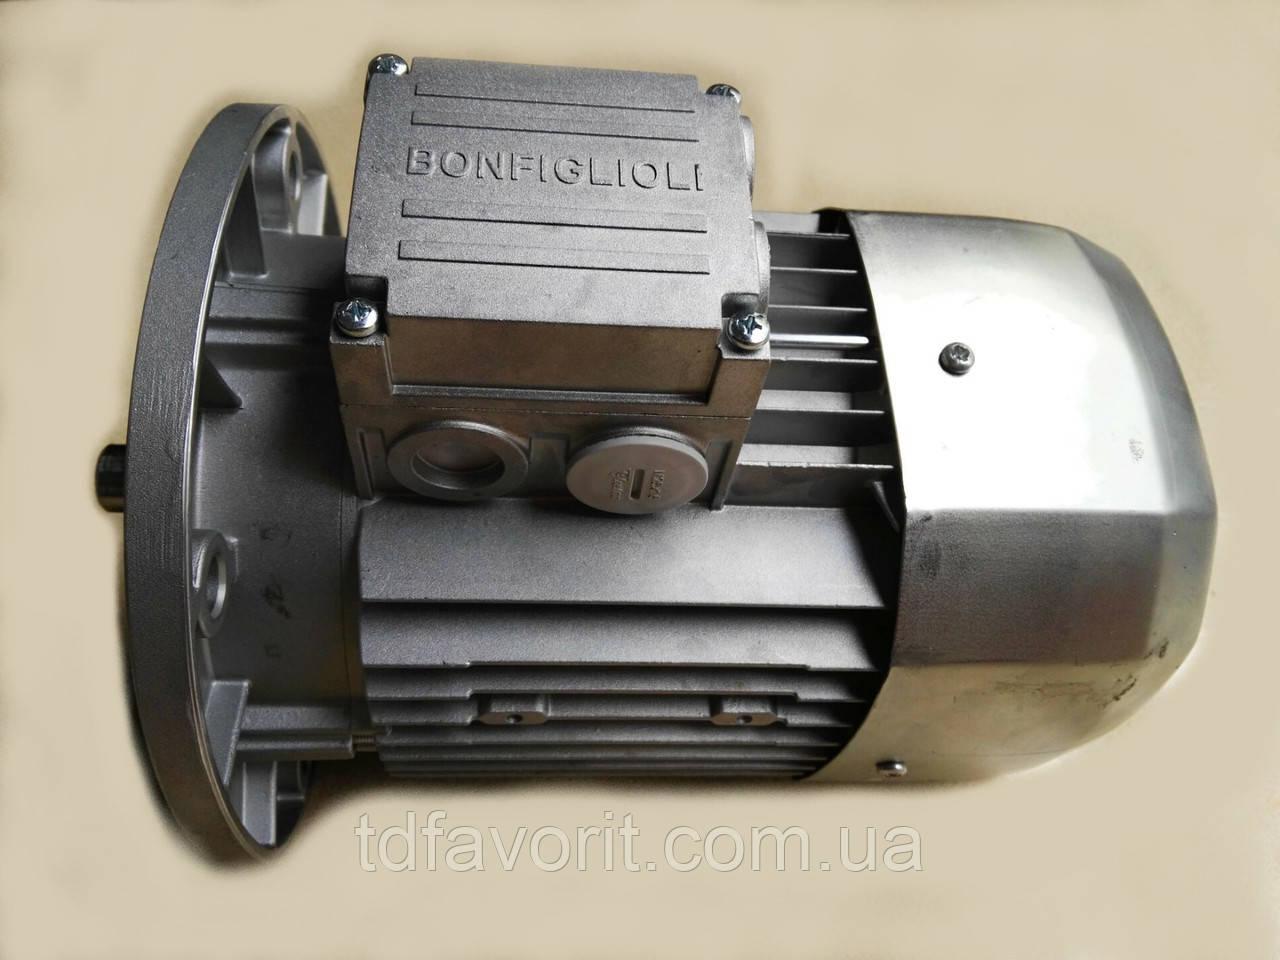 Двигатель Bonfiglioli  BN 63A4 230/400 IP55 CLF B14 (P1=0,12 кВт, n1=1500 об/хв)